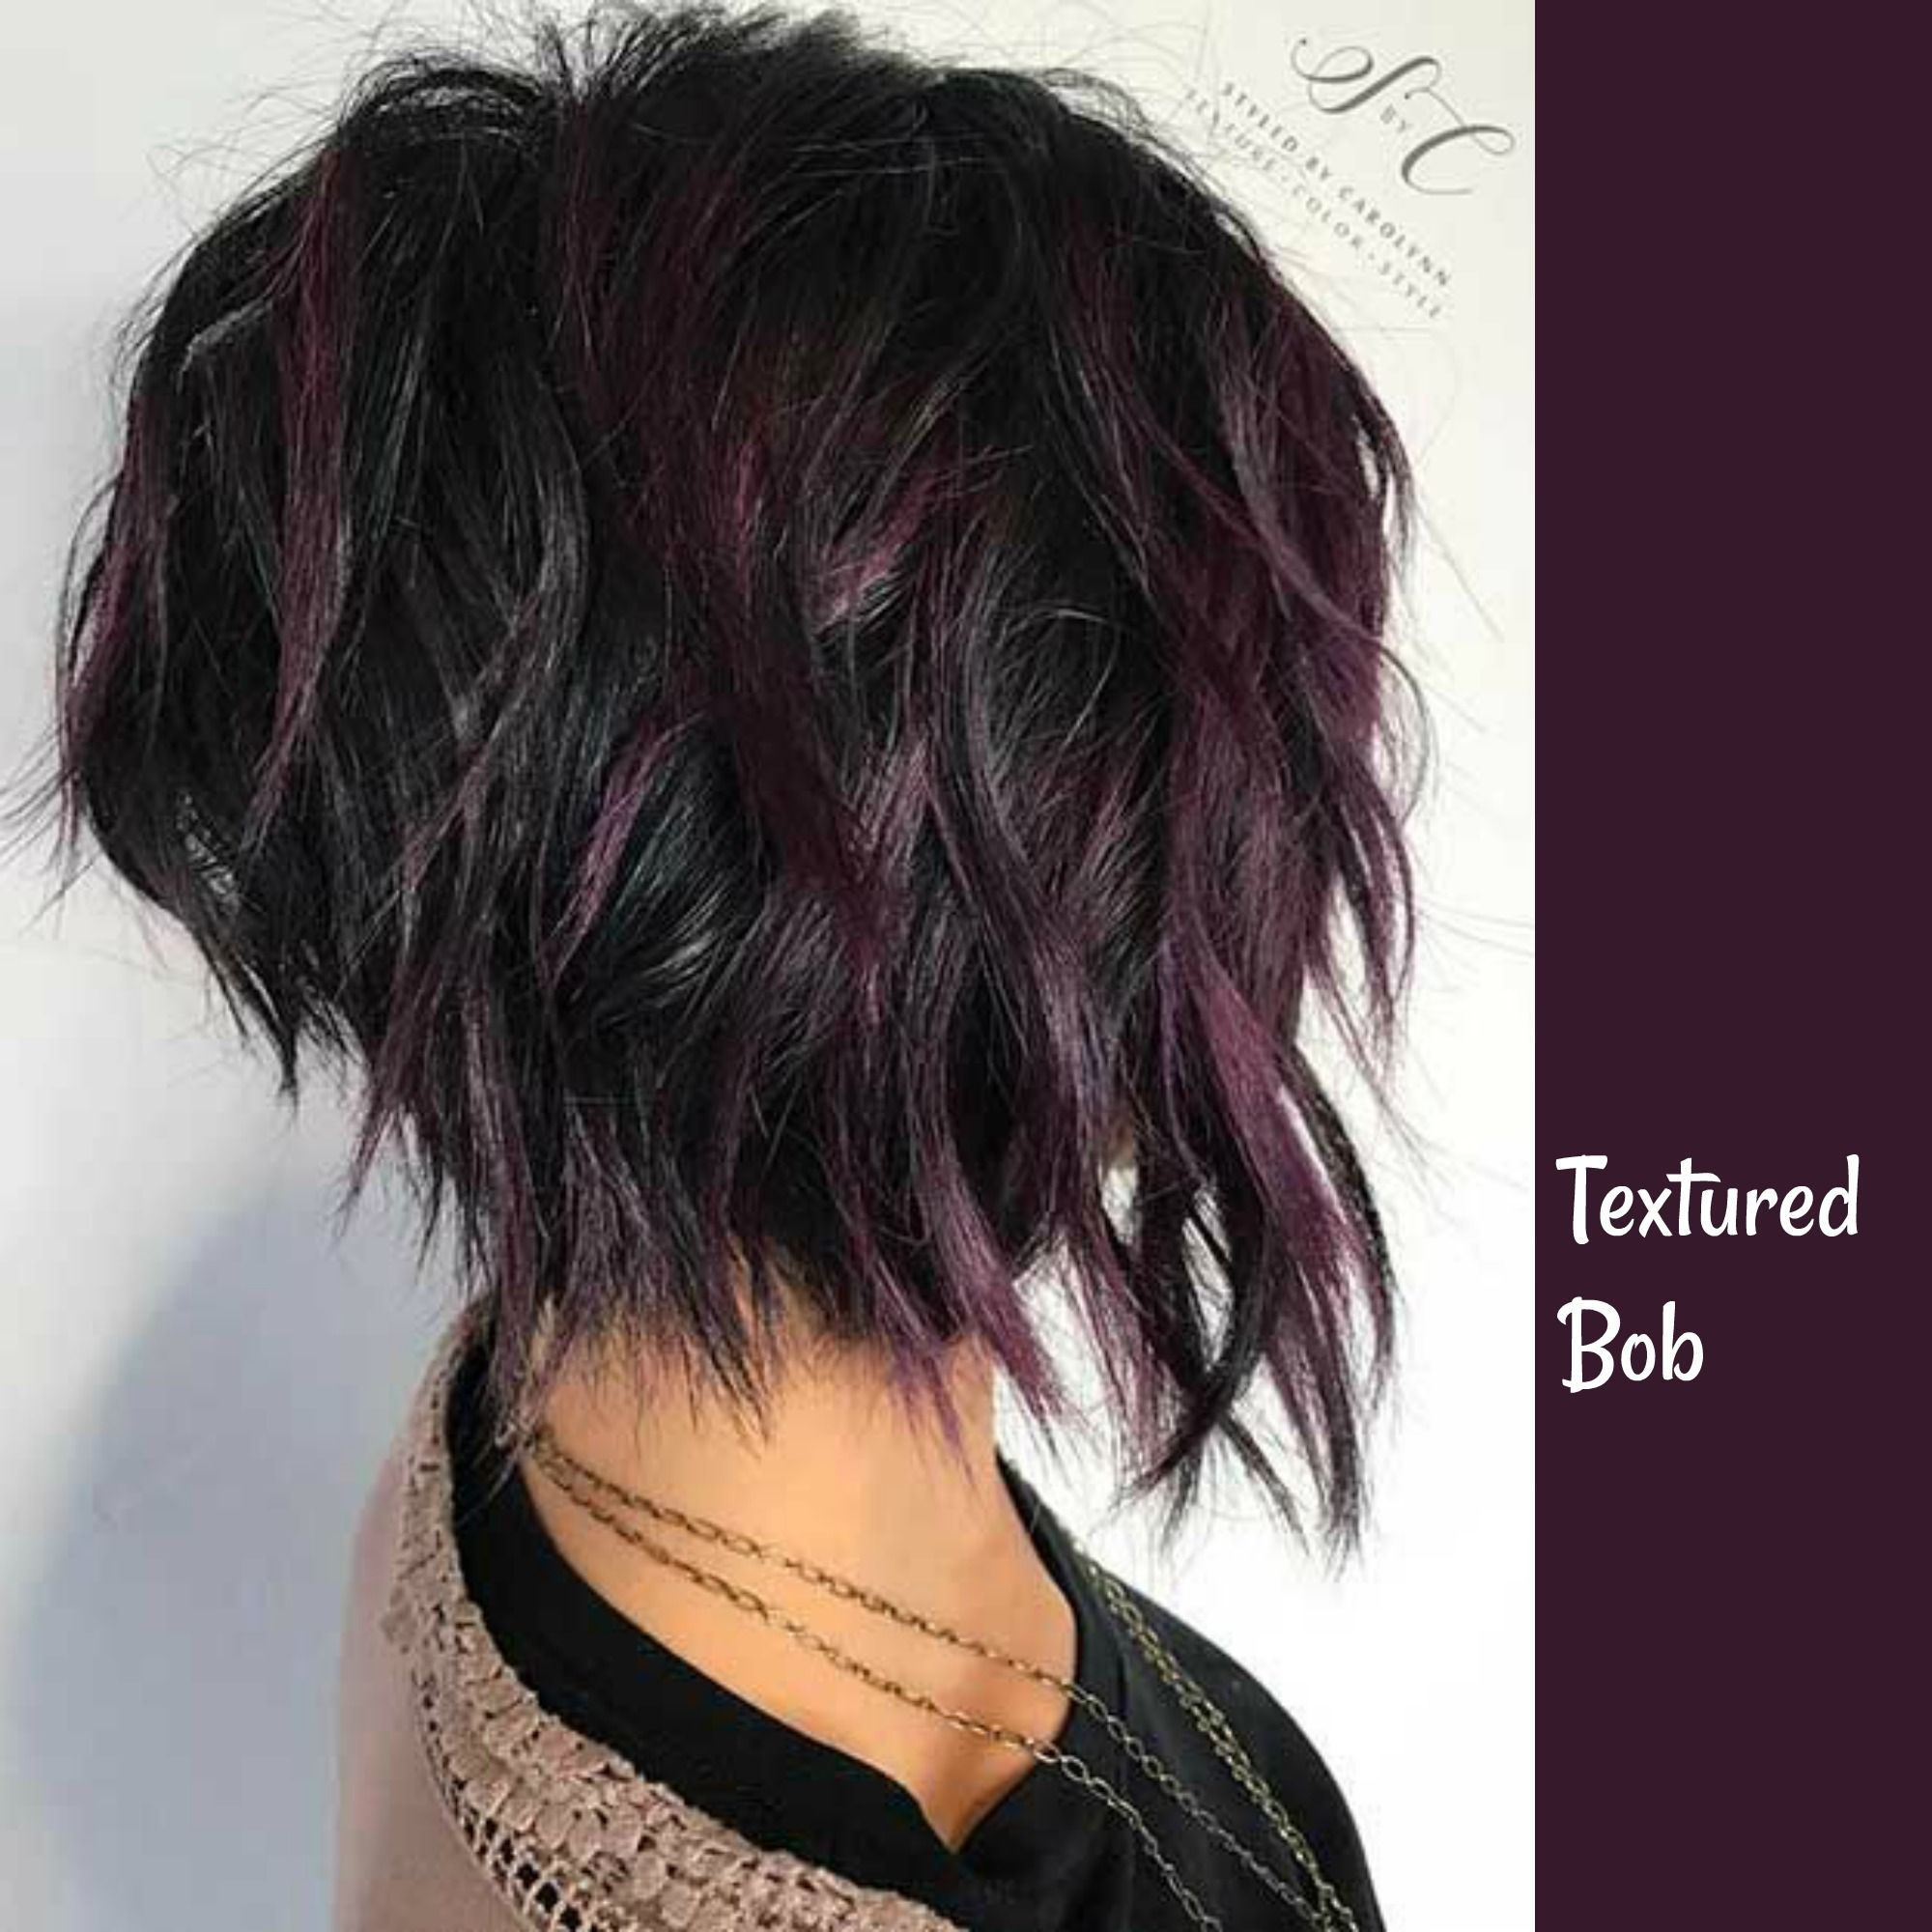 Textured bob with purple highlights on dark hair hair pinterest